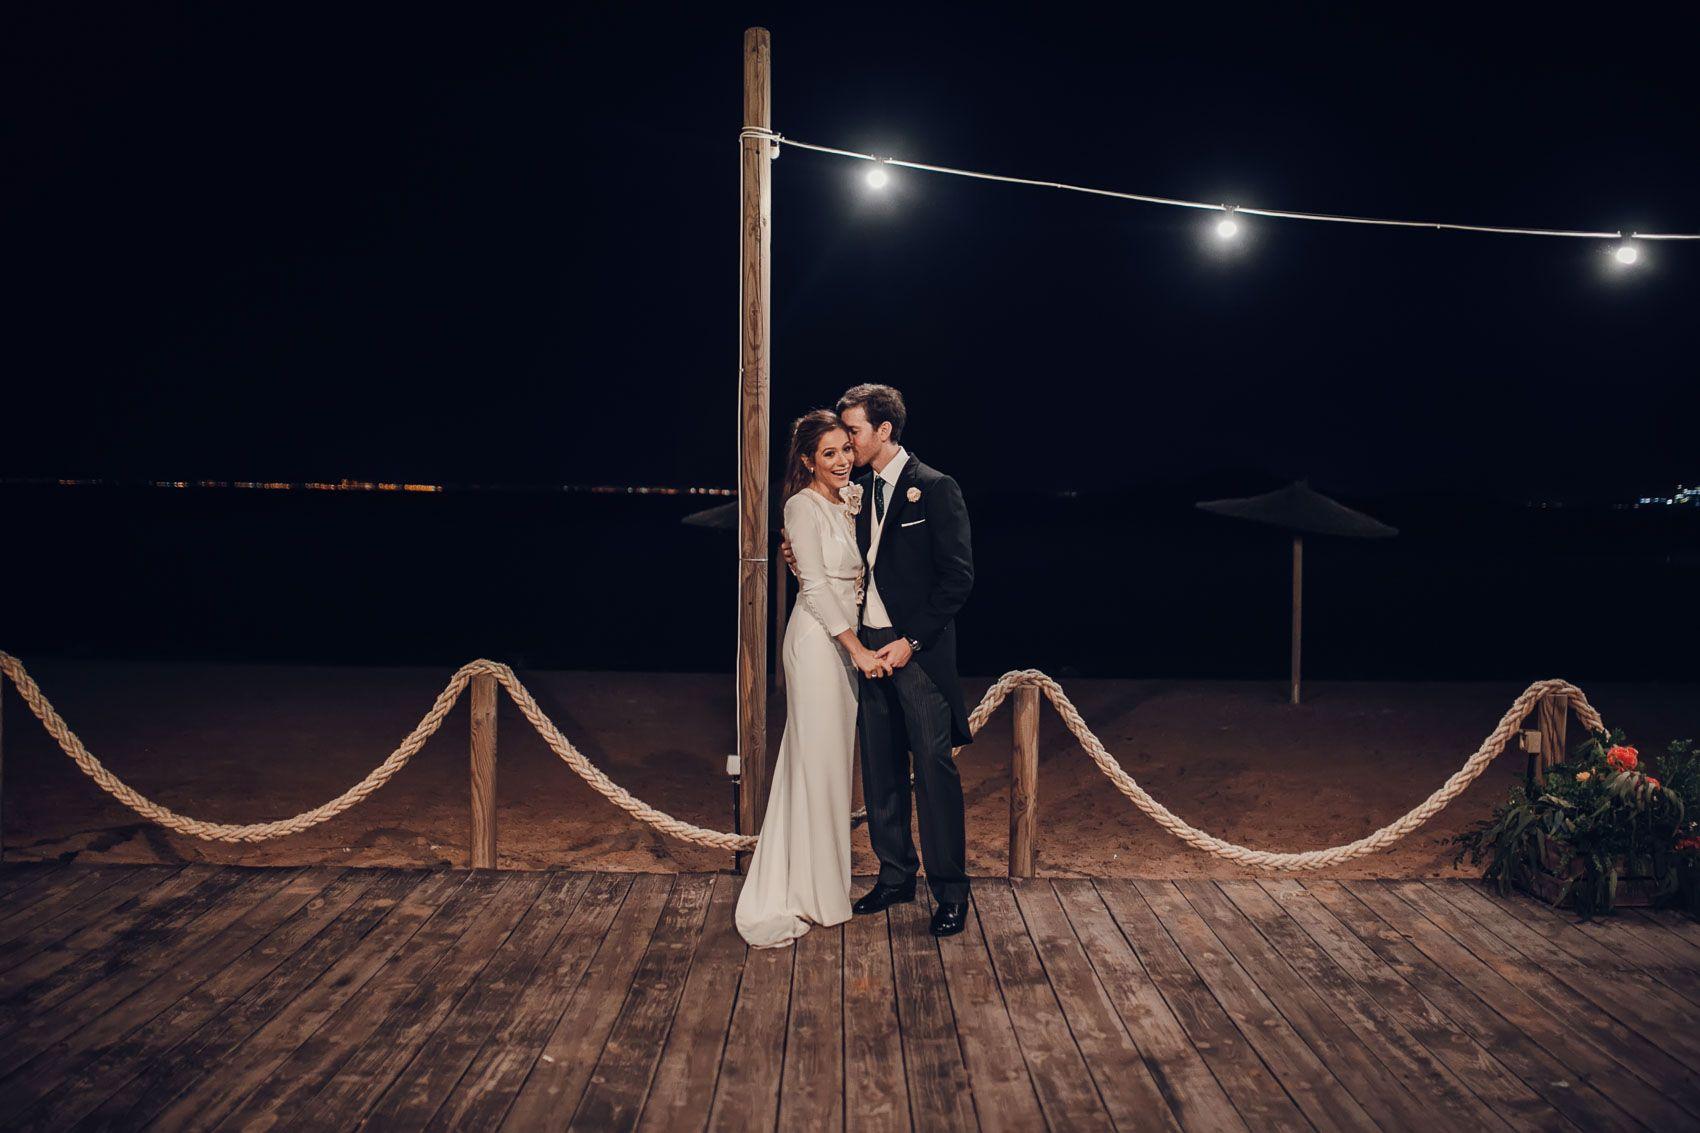 pareja novios beso playa paseo madera